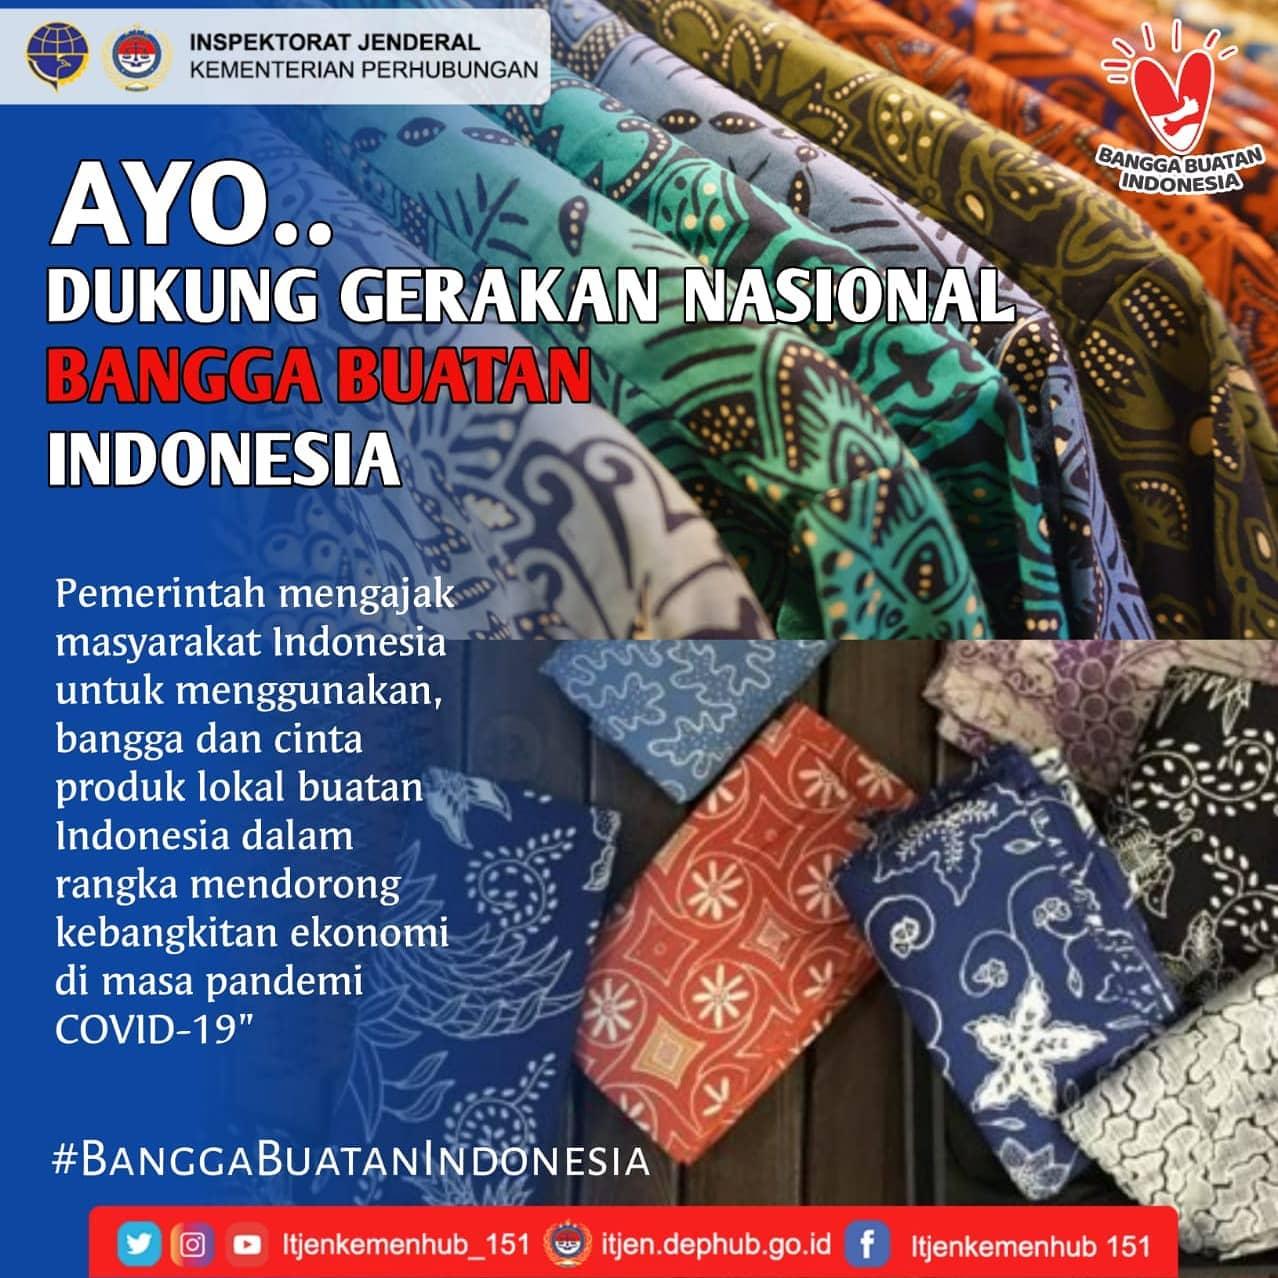 Bangga Buatan Indonesia